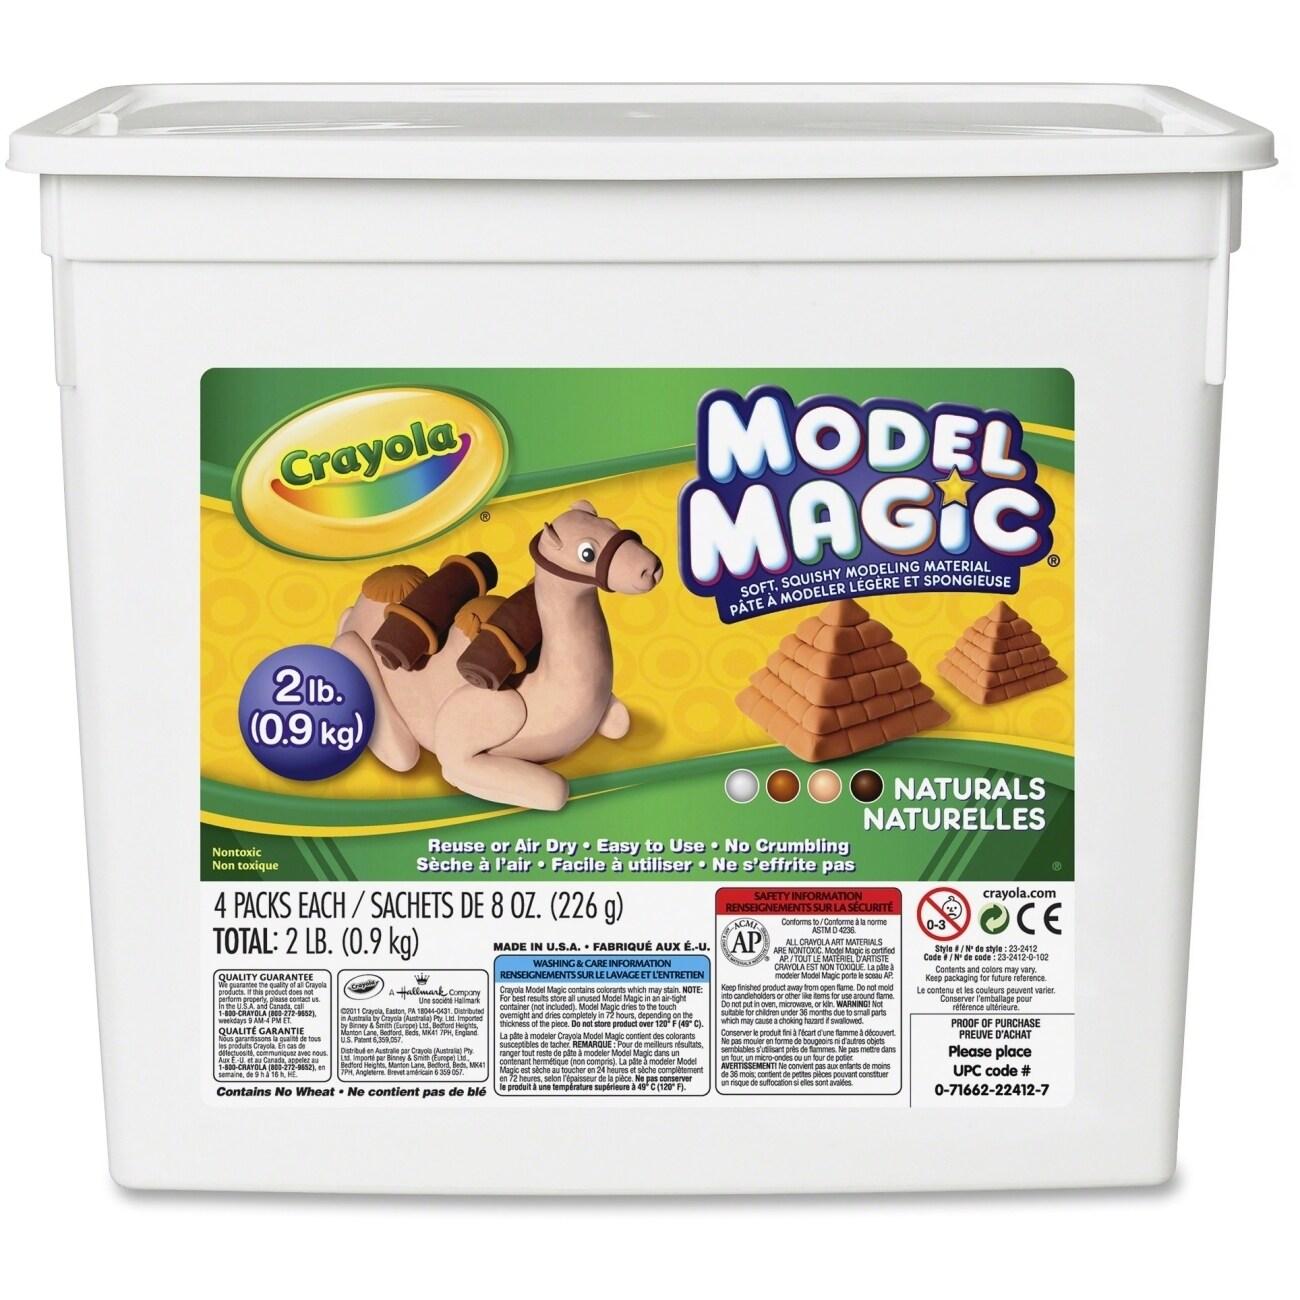 Crayola Model Magic 2 lb. Resealable Bucket - Natural Col...